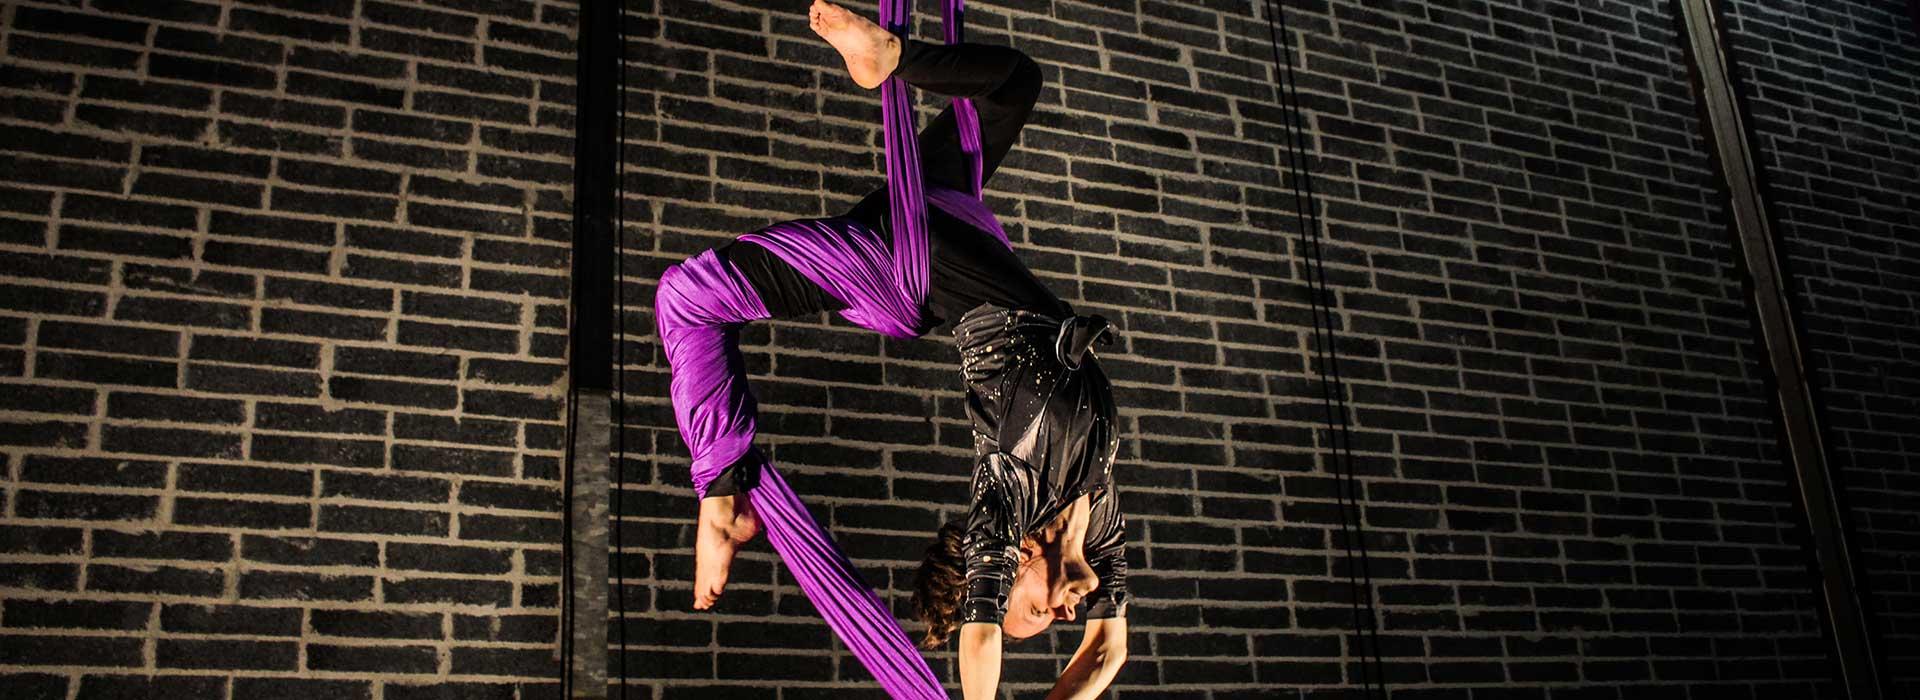 Irish Aerial Creation Centre Artist hanging from purple silk